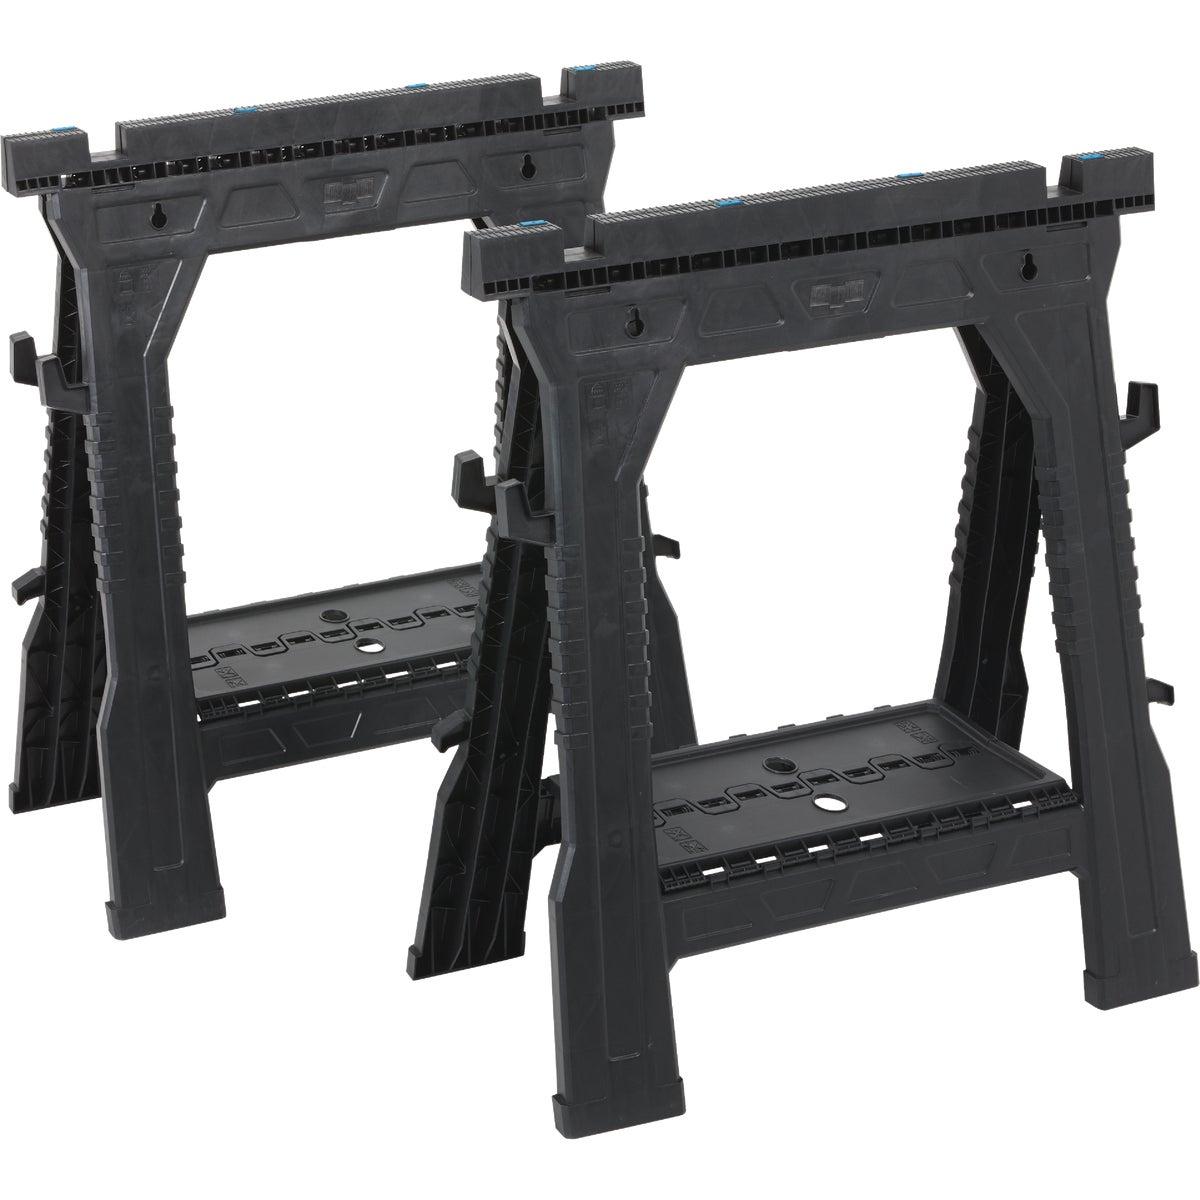 Channellock Folding Sawhorse Set